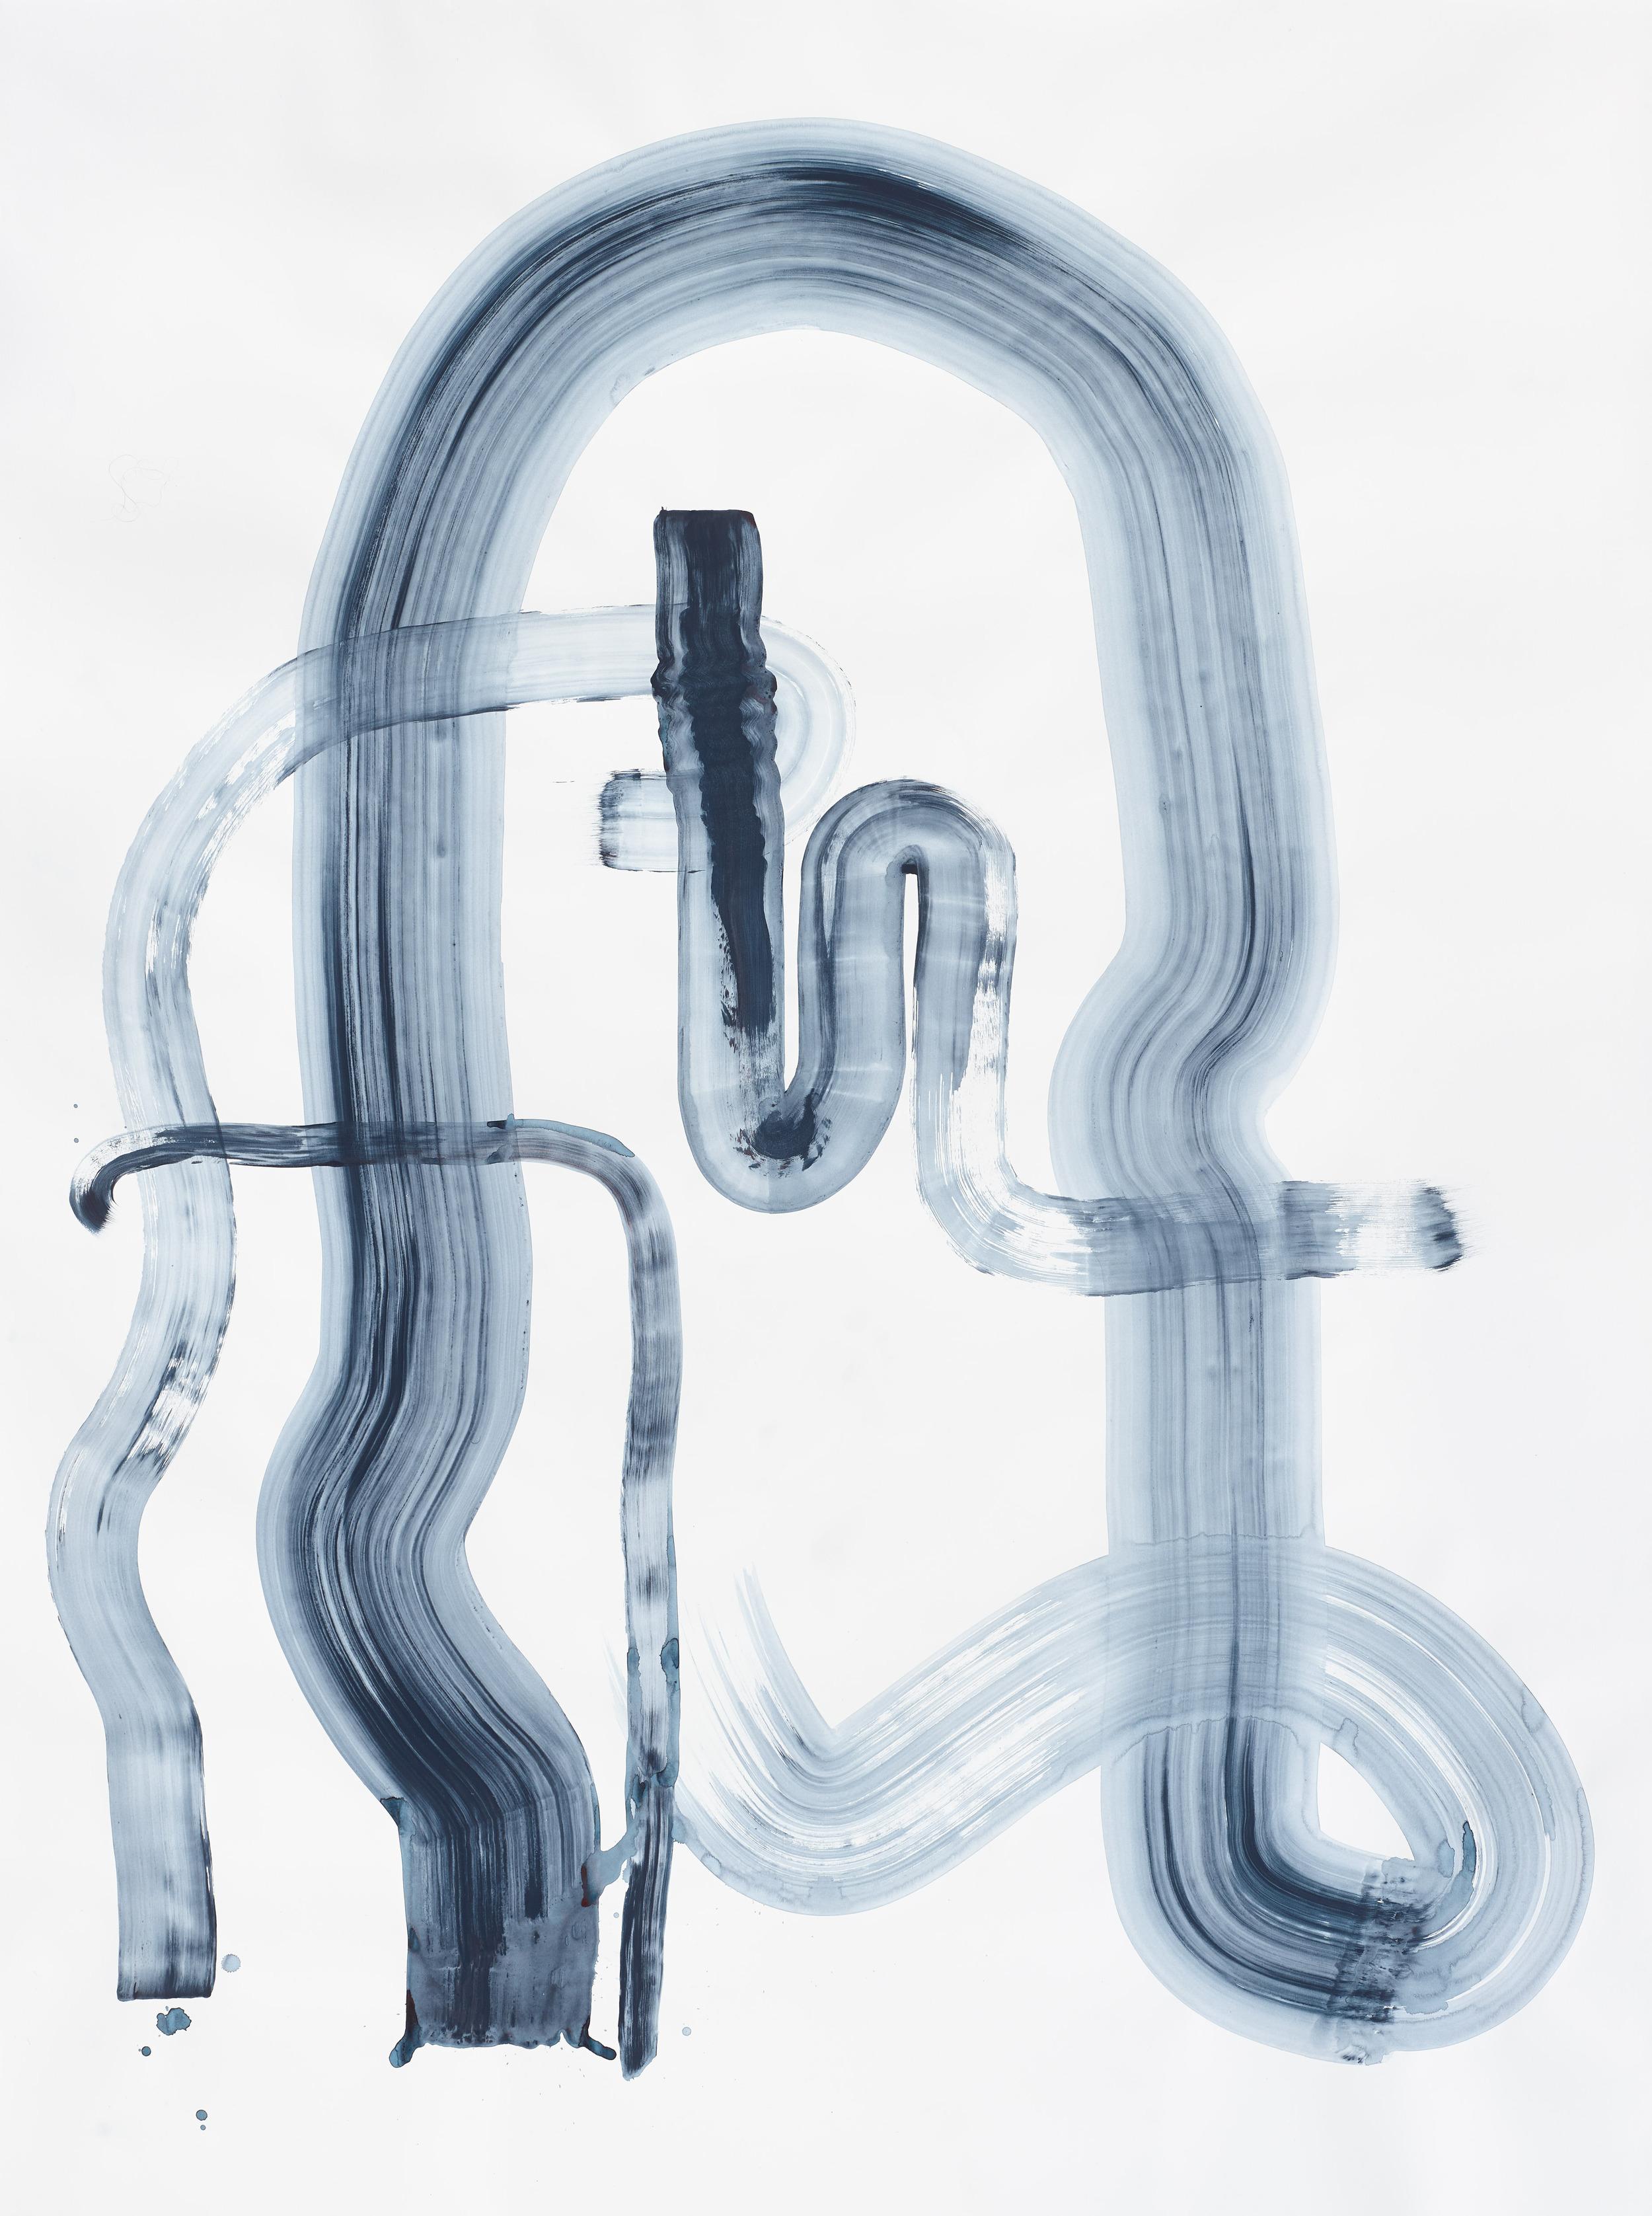 BK P0839 | untitled | acrylic paint on paper | 200x150cm | 2015